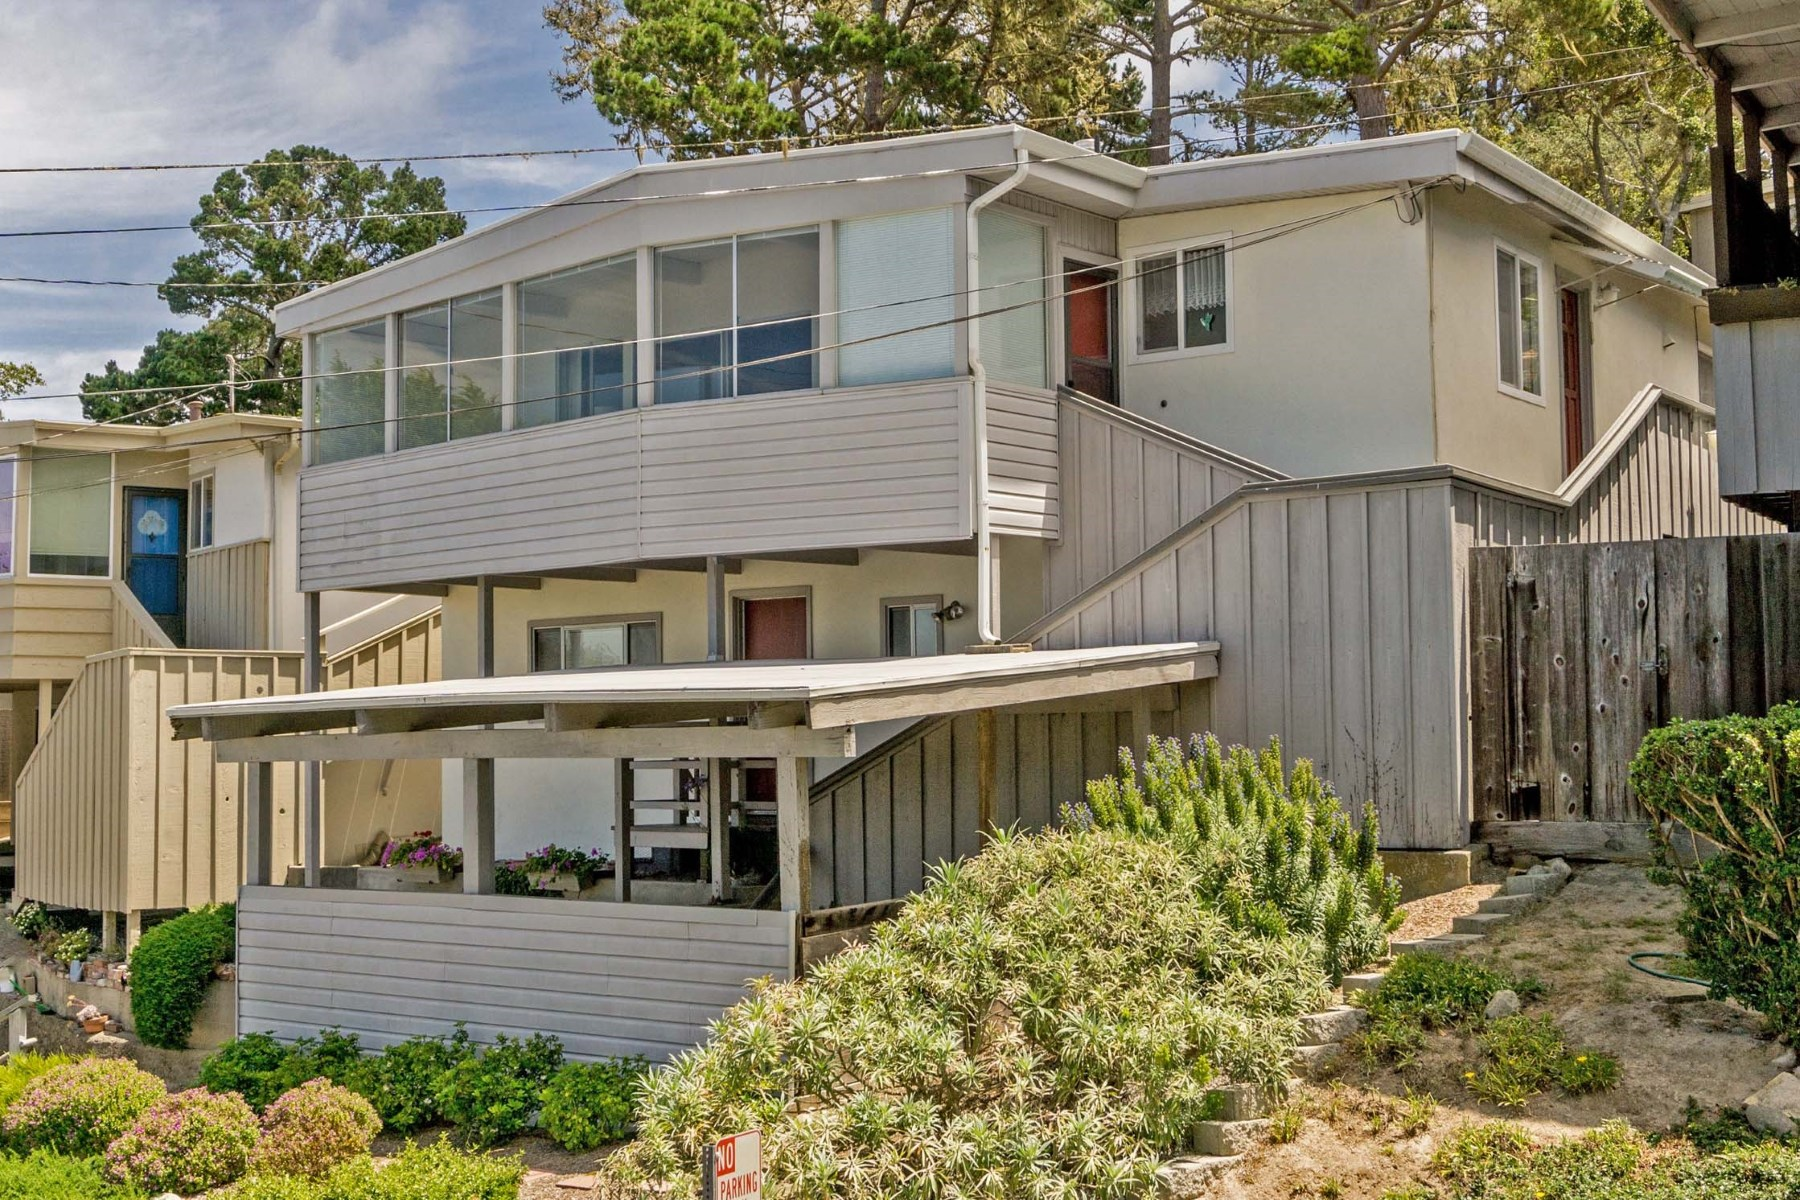 Nhà ở một gia đình vì Bán tại High on a Hill with Ocean Views 1149 Presidio Boulevard Pacific Grove, California 93950 Hoa Kỳ